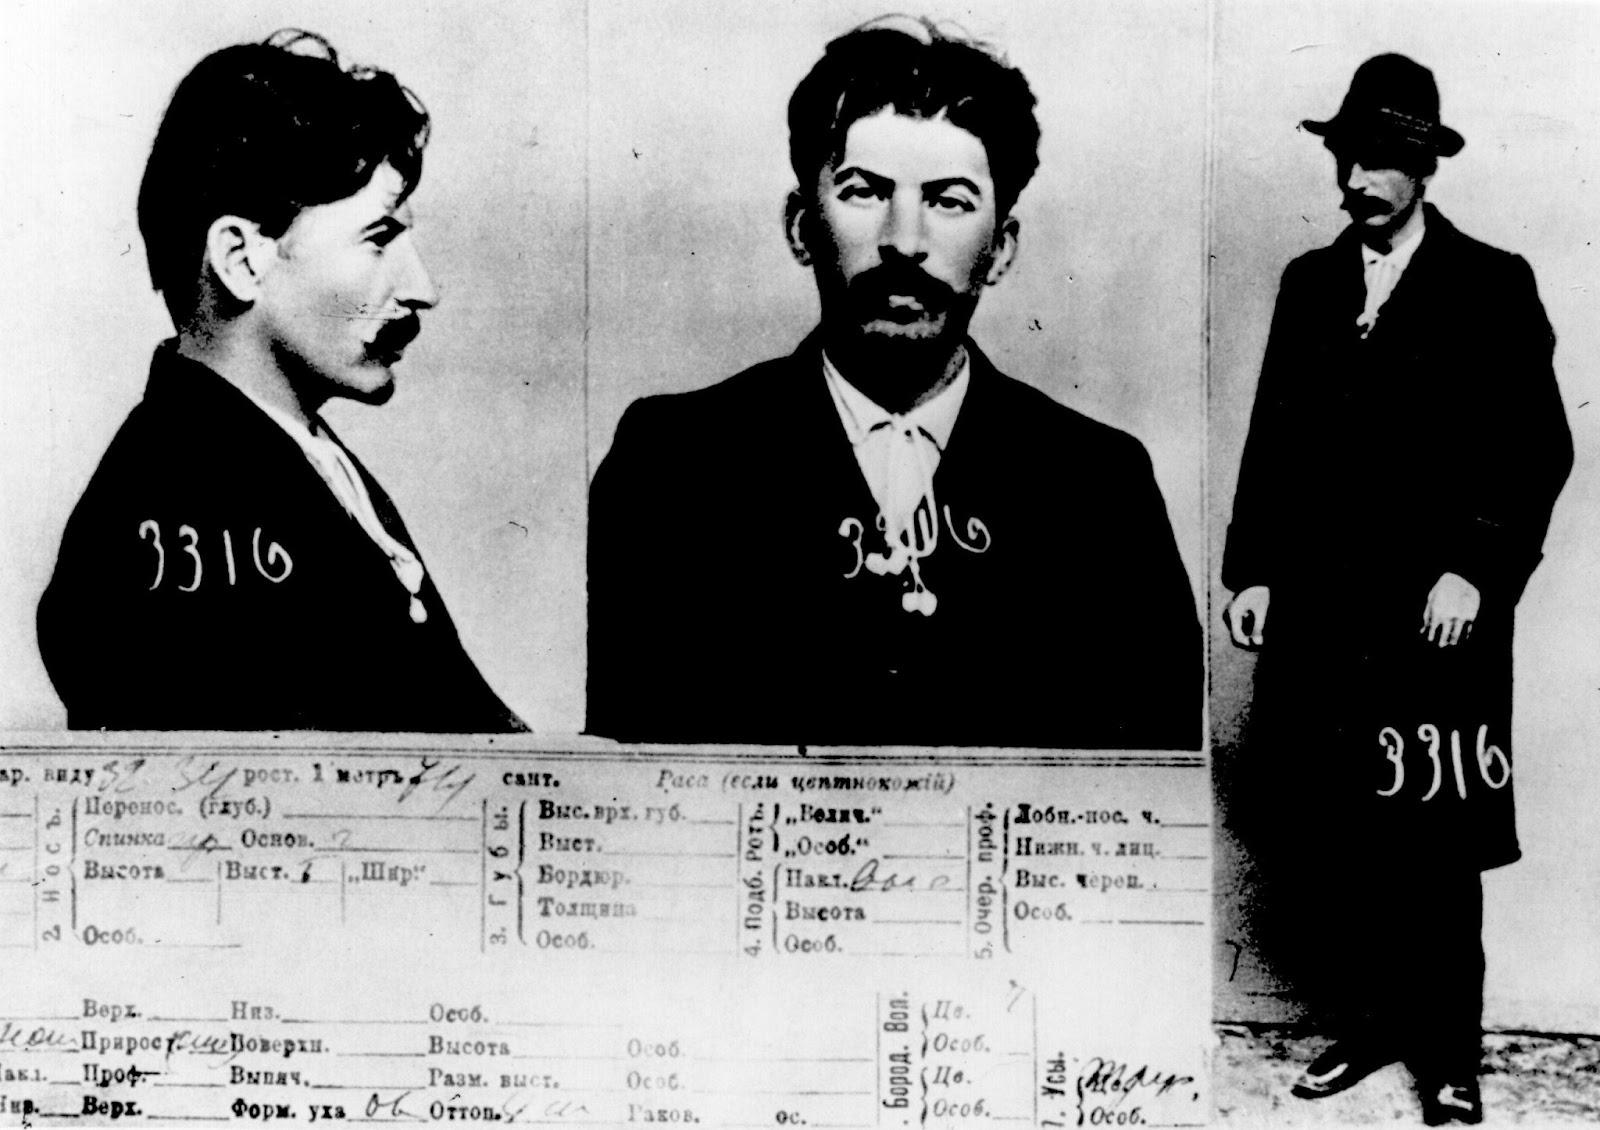 Mugshot of Joseph Stalin held by Okhrana: the Tsarist Secret Police, 1911